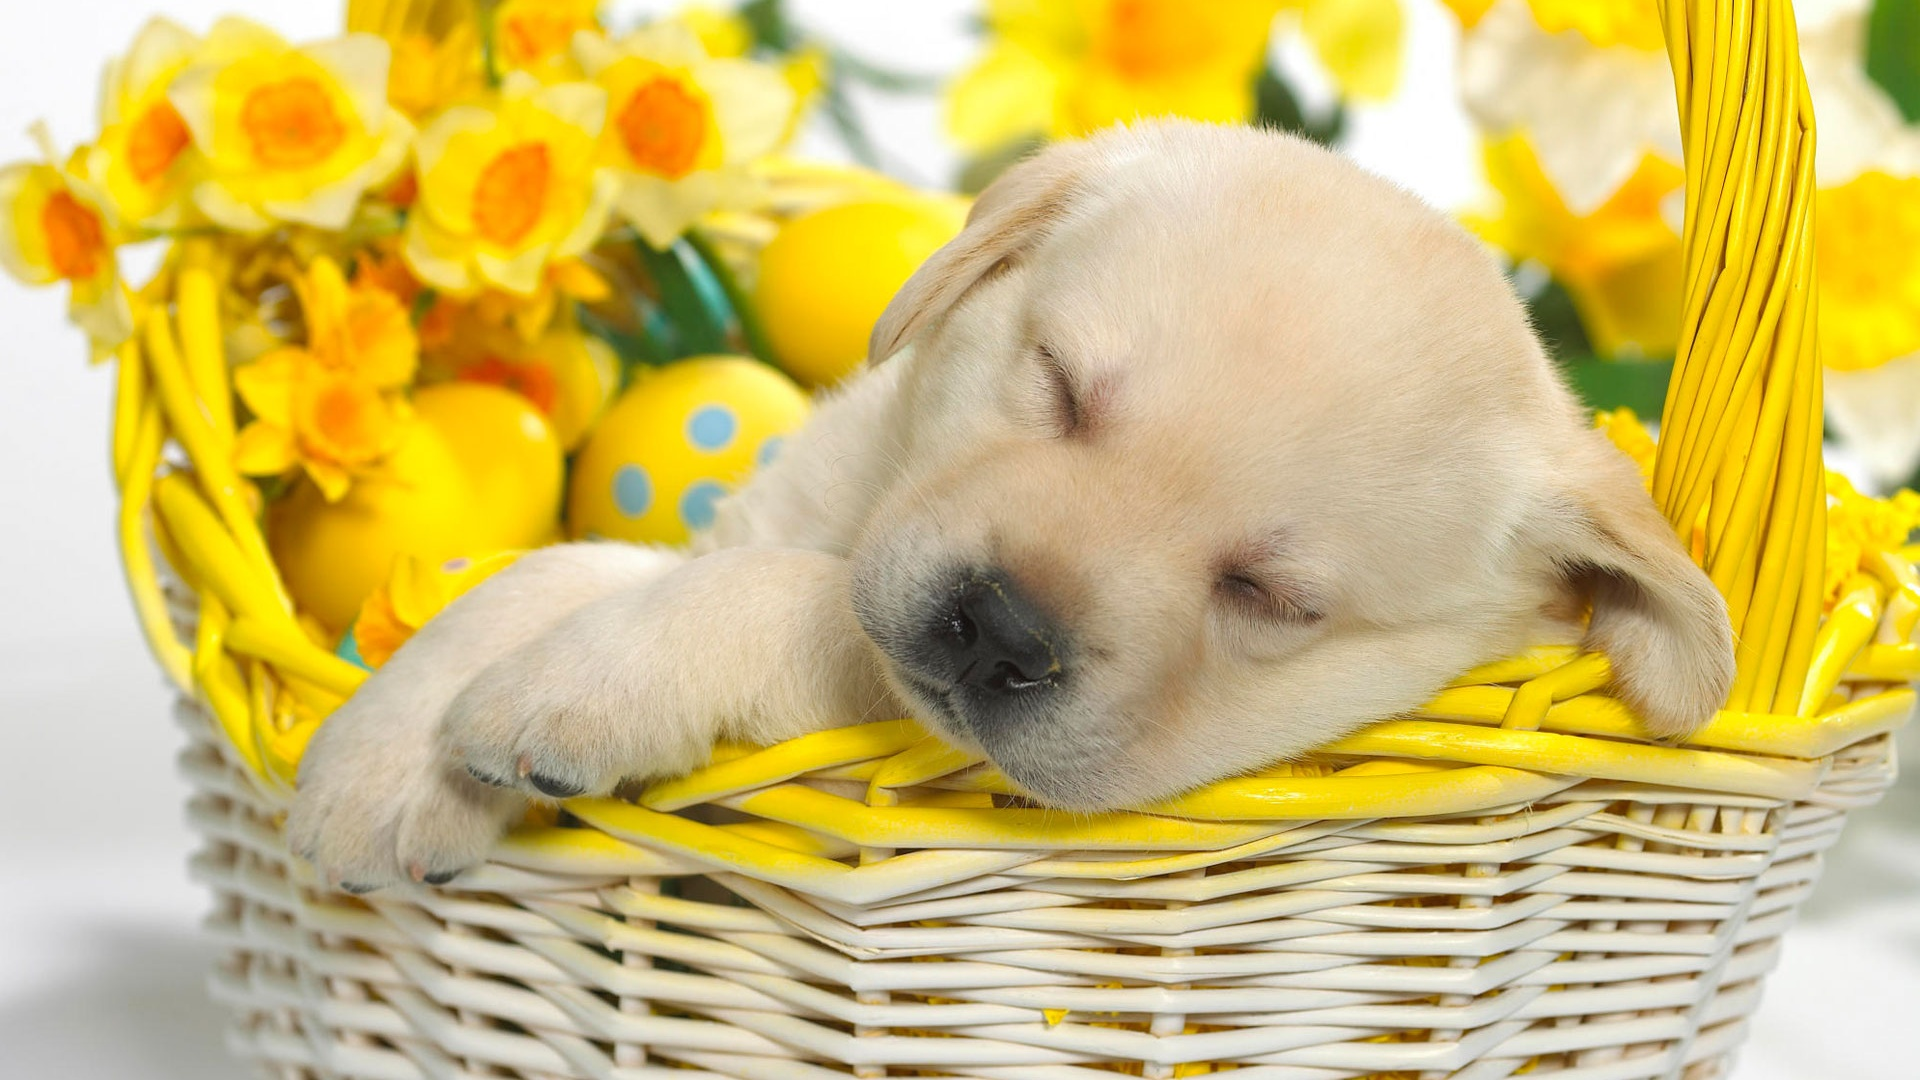 Spring puppy wallpaper   ForWallpapercom 1920x1080